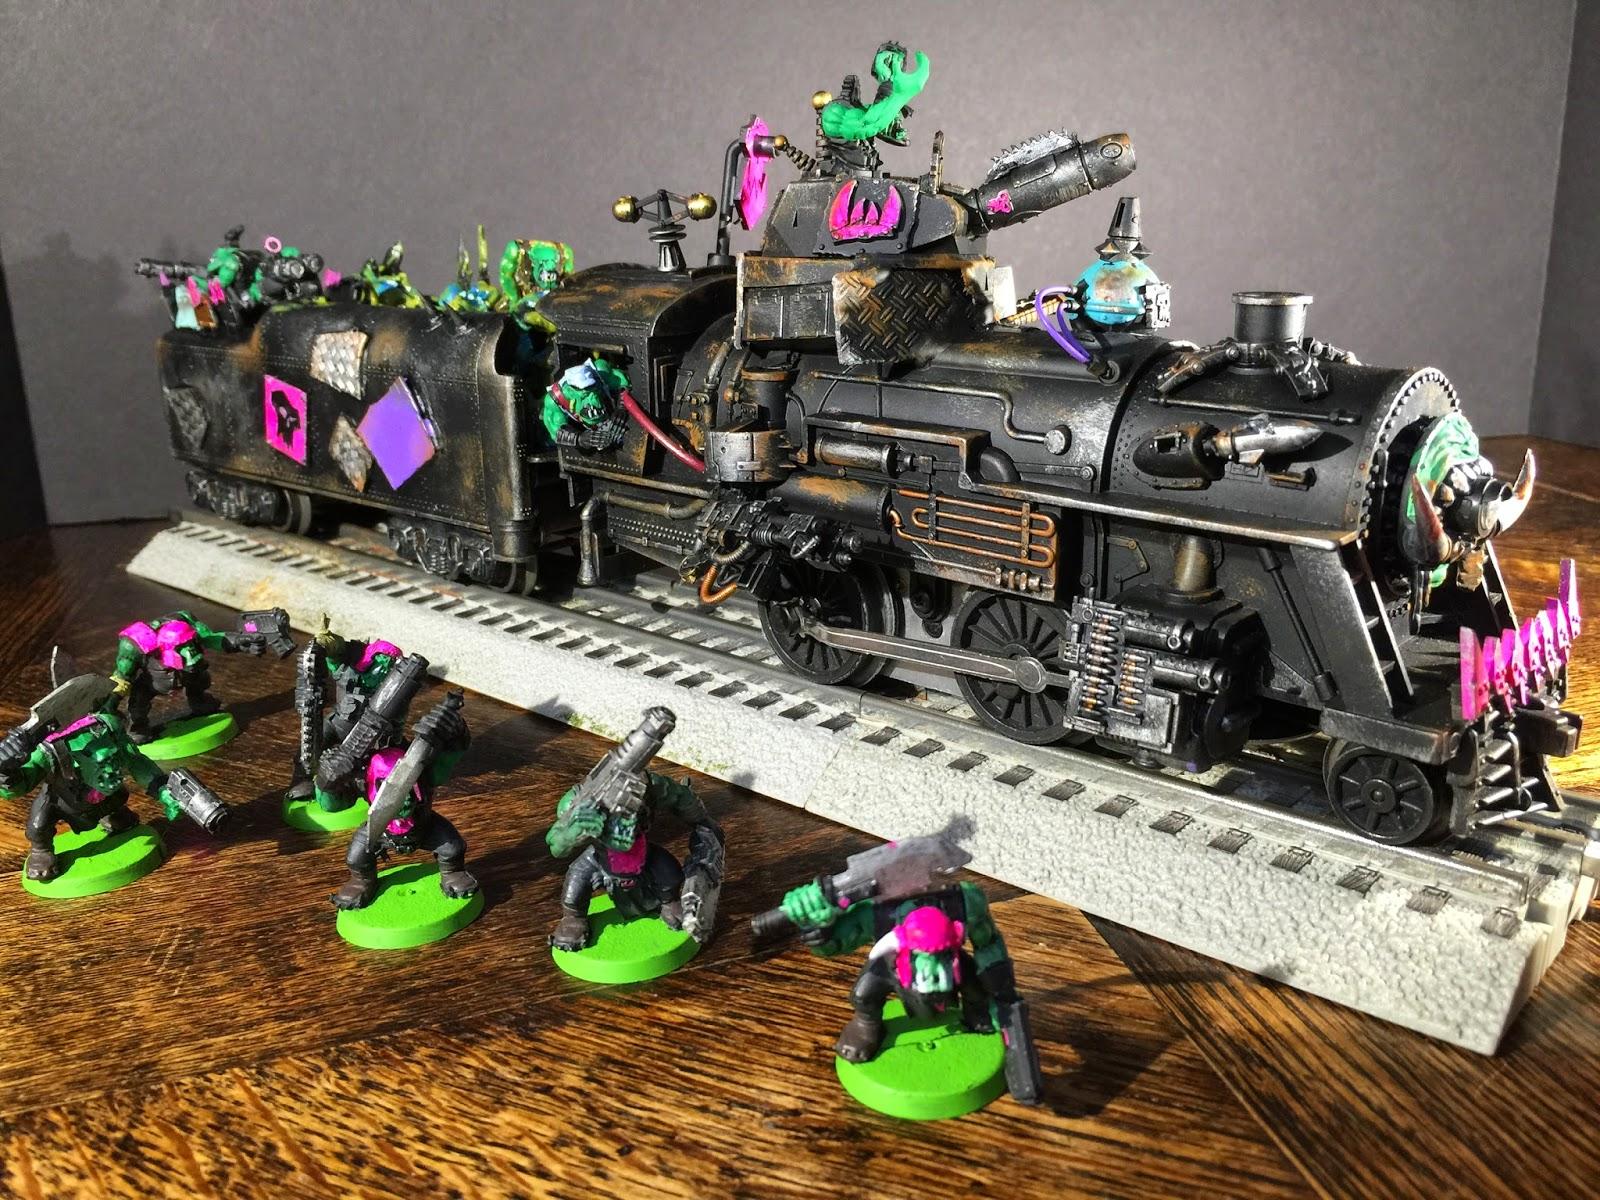 Pink Orks; Dakka Chugga; Ork Train; Ork Steam Train; Ork Locomotive; Battle Gaming One